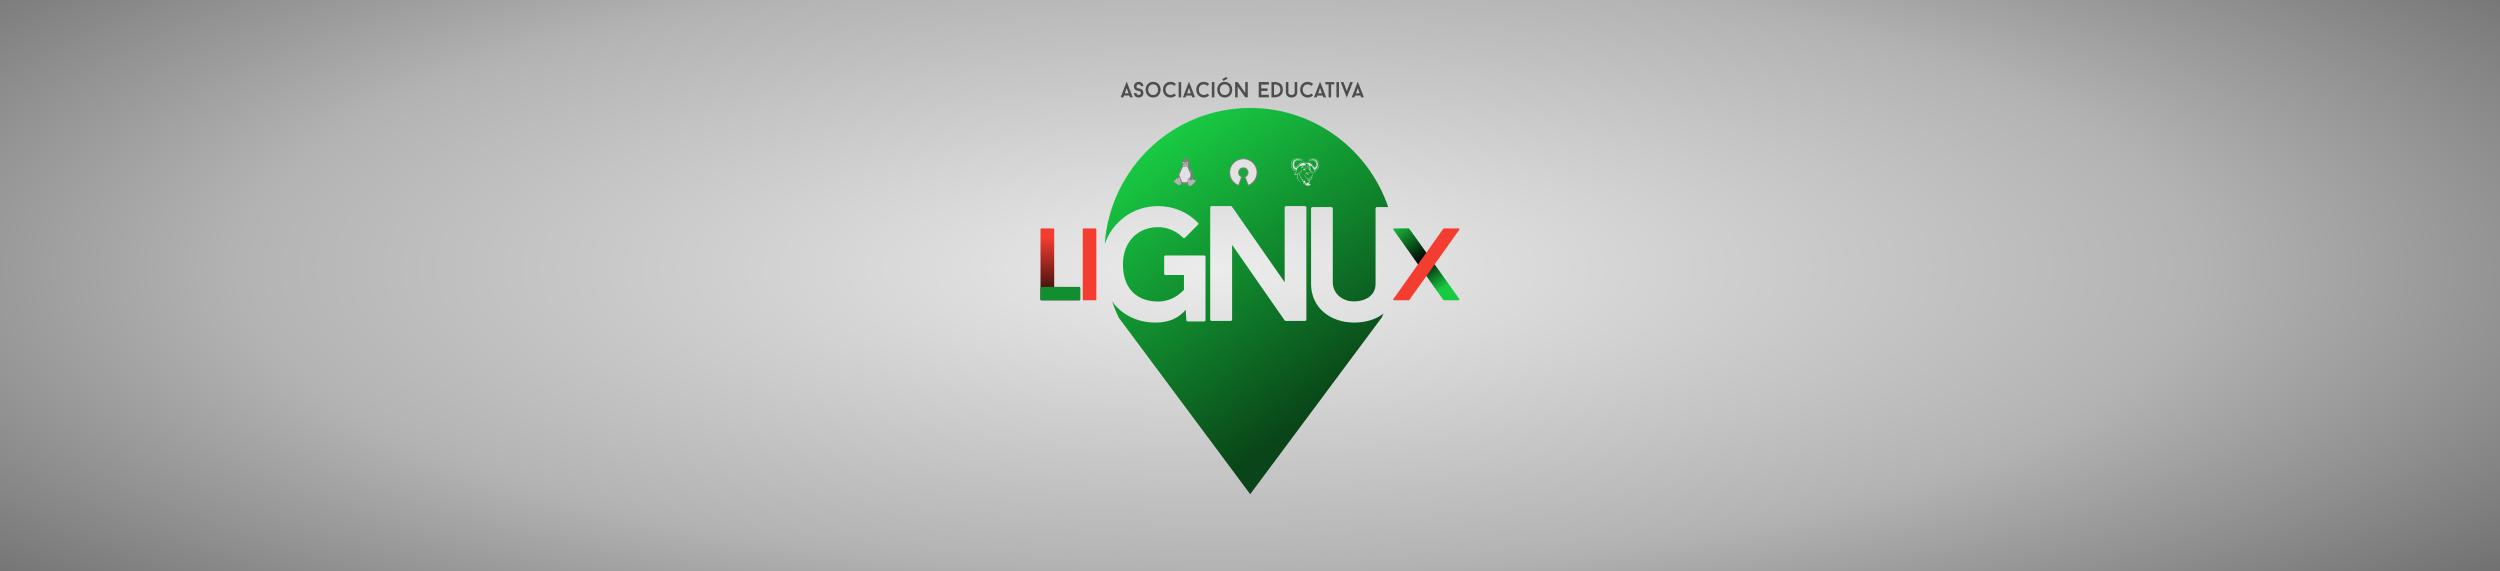 LiGNUx